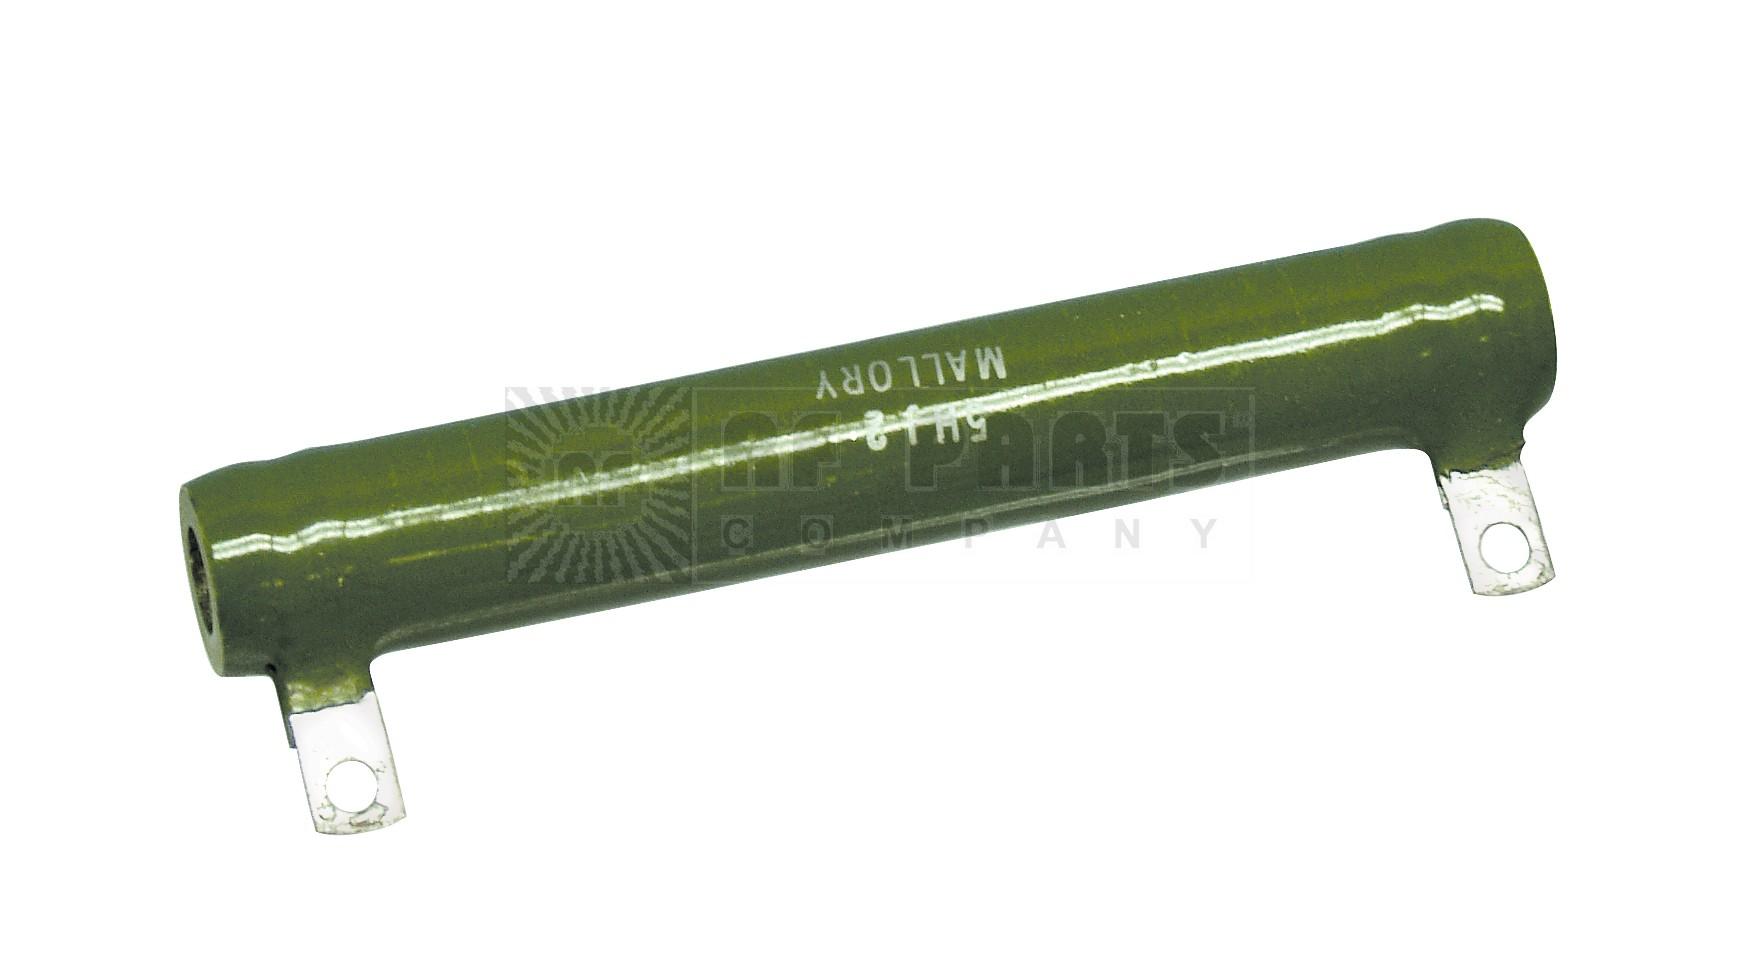 5HJ2 Resistor, 2ohm 50w mallory